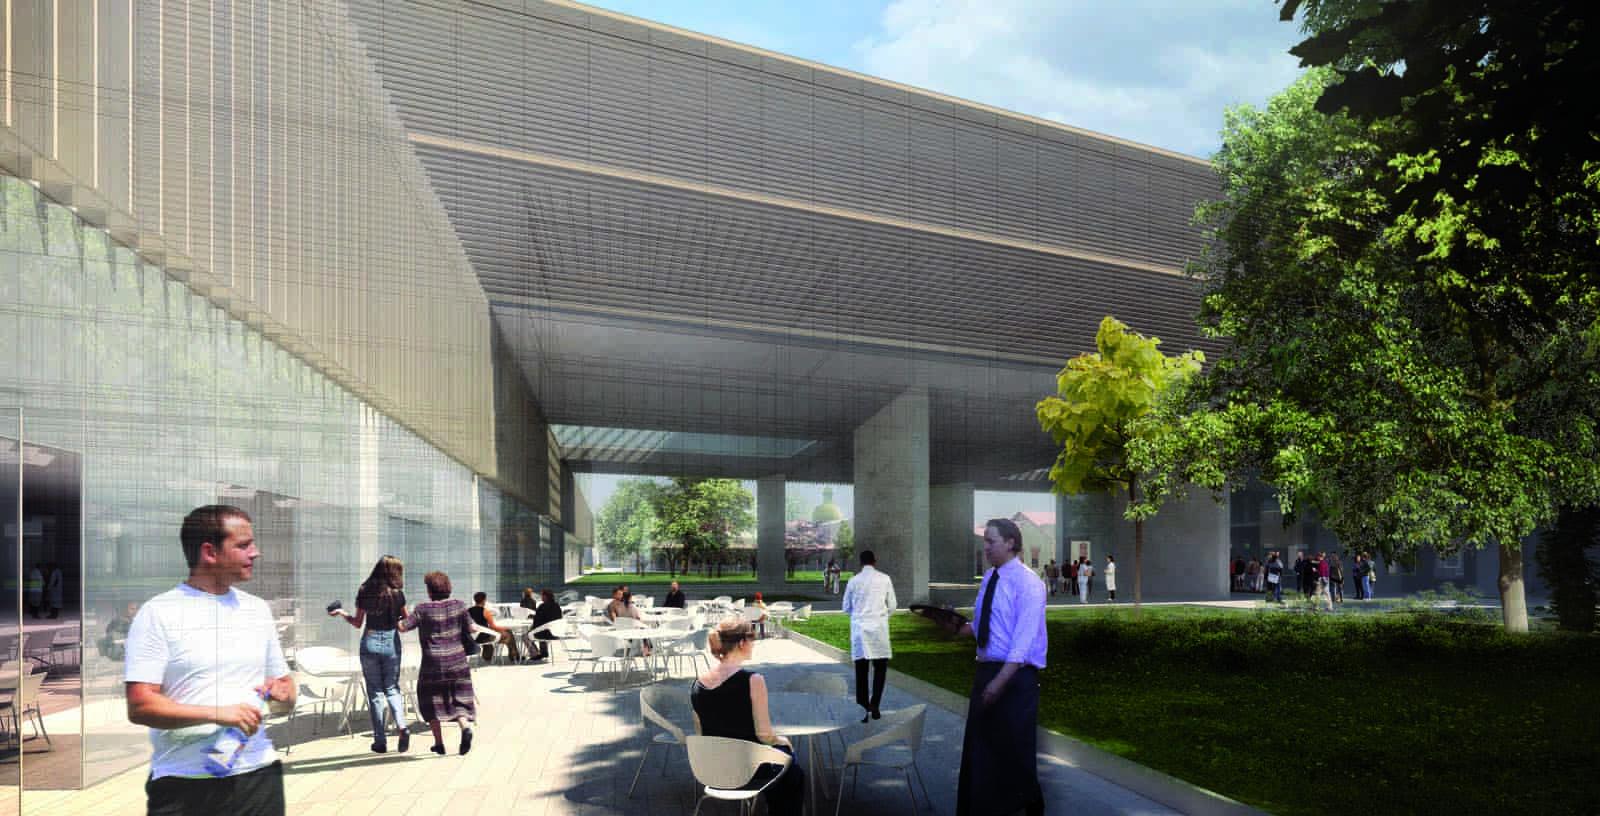 El_Salvador_hospital_03_Architecture_IDOM_computer_graphics_Poliedro